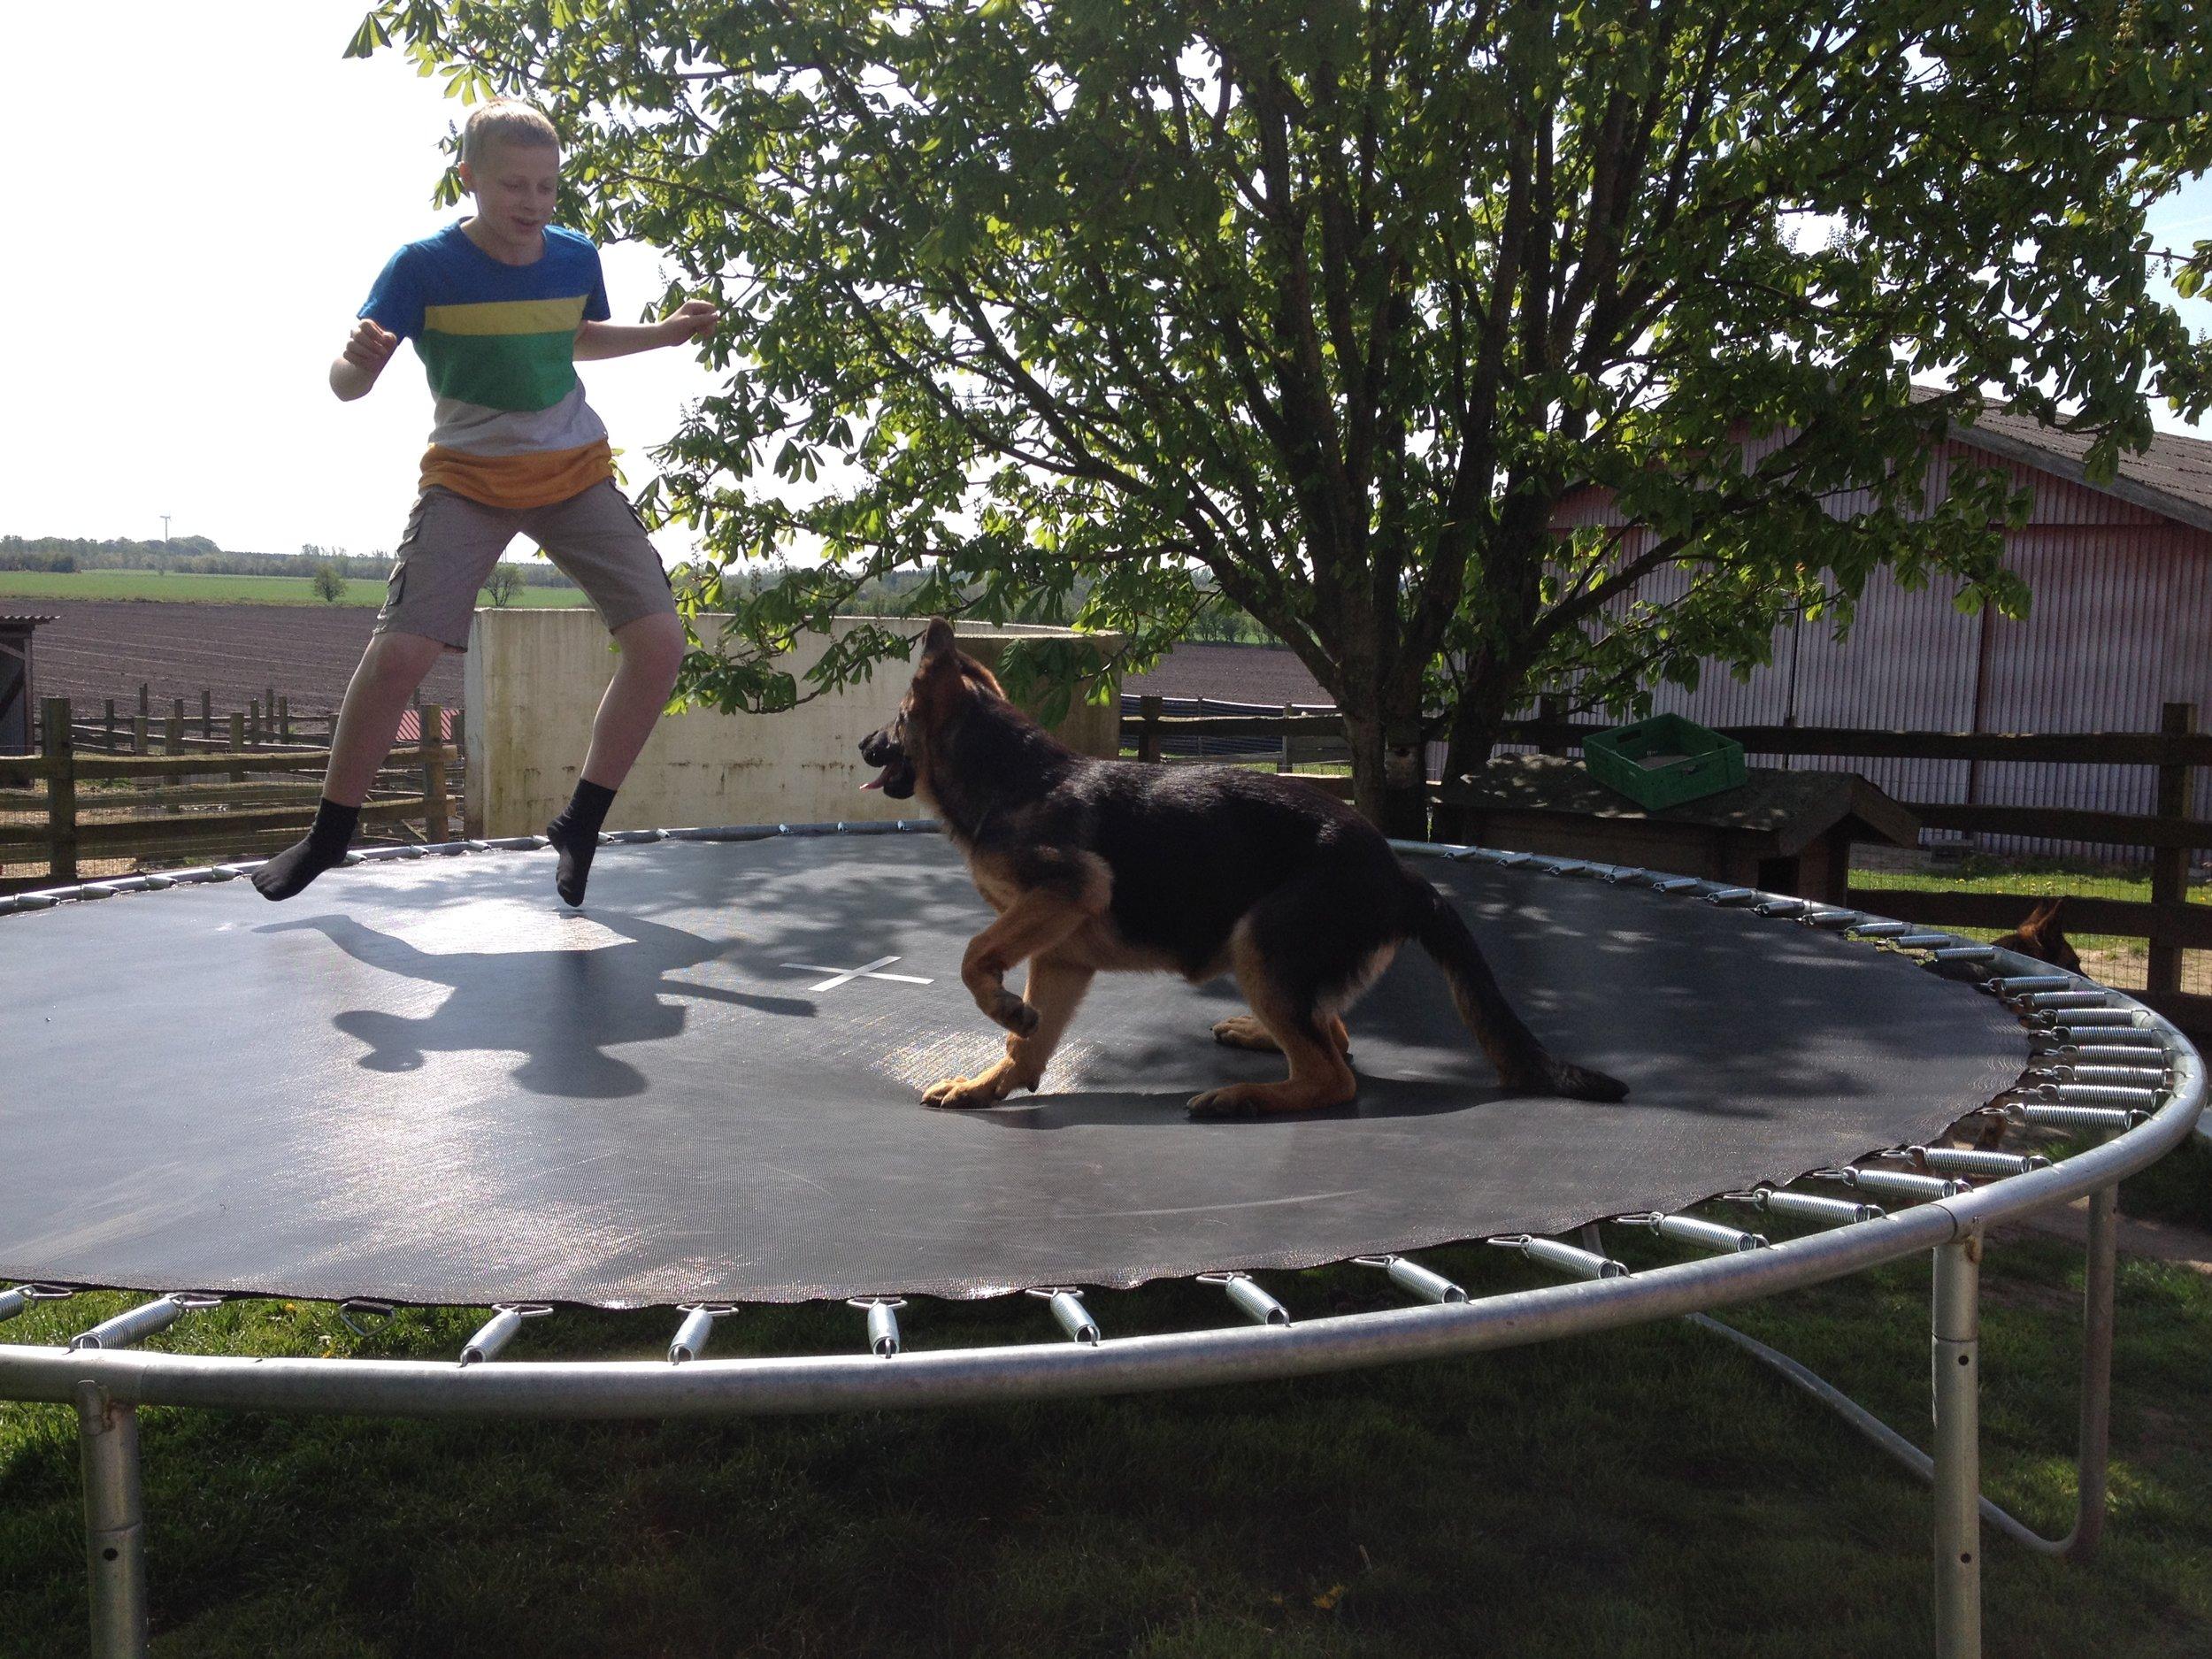 Mikkel og schæferhvalp springer trampolin.JPG